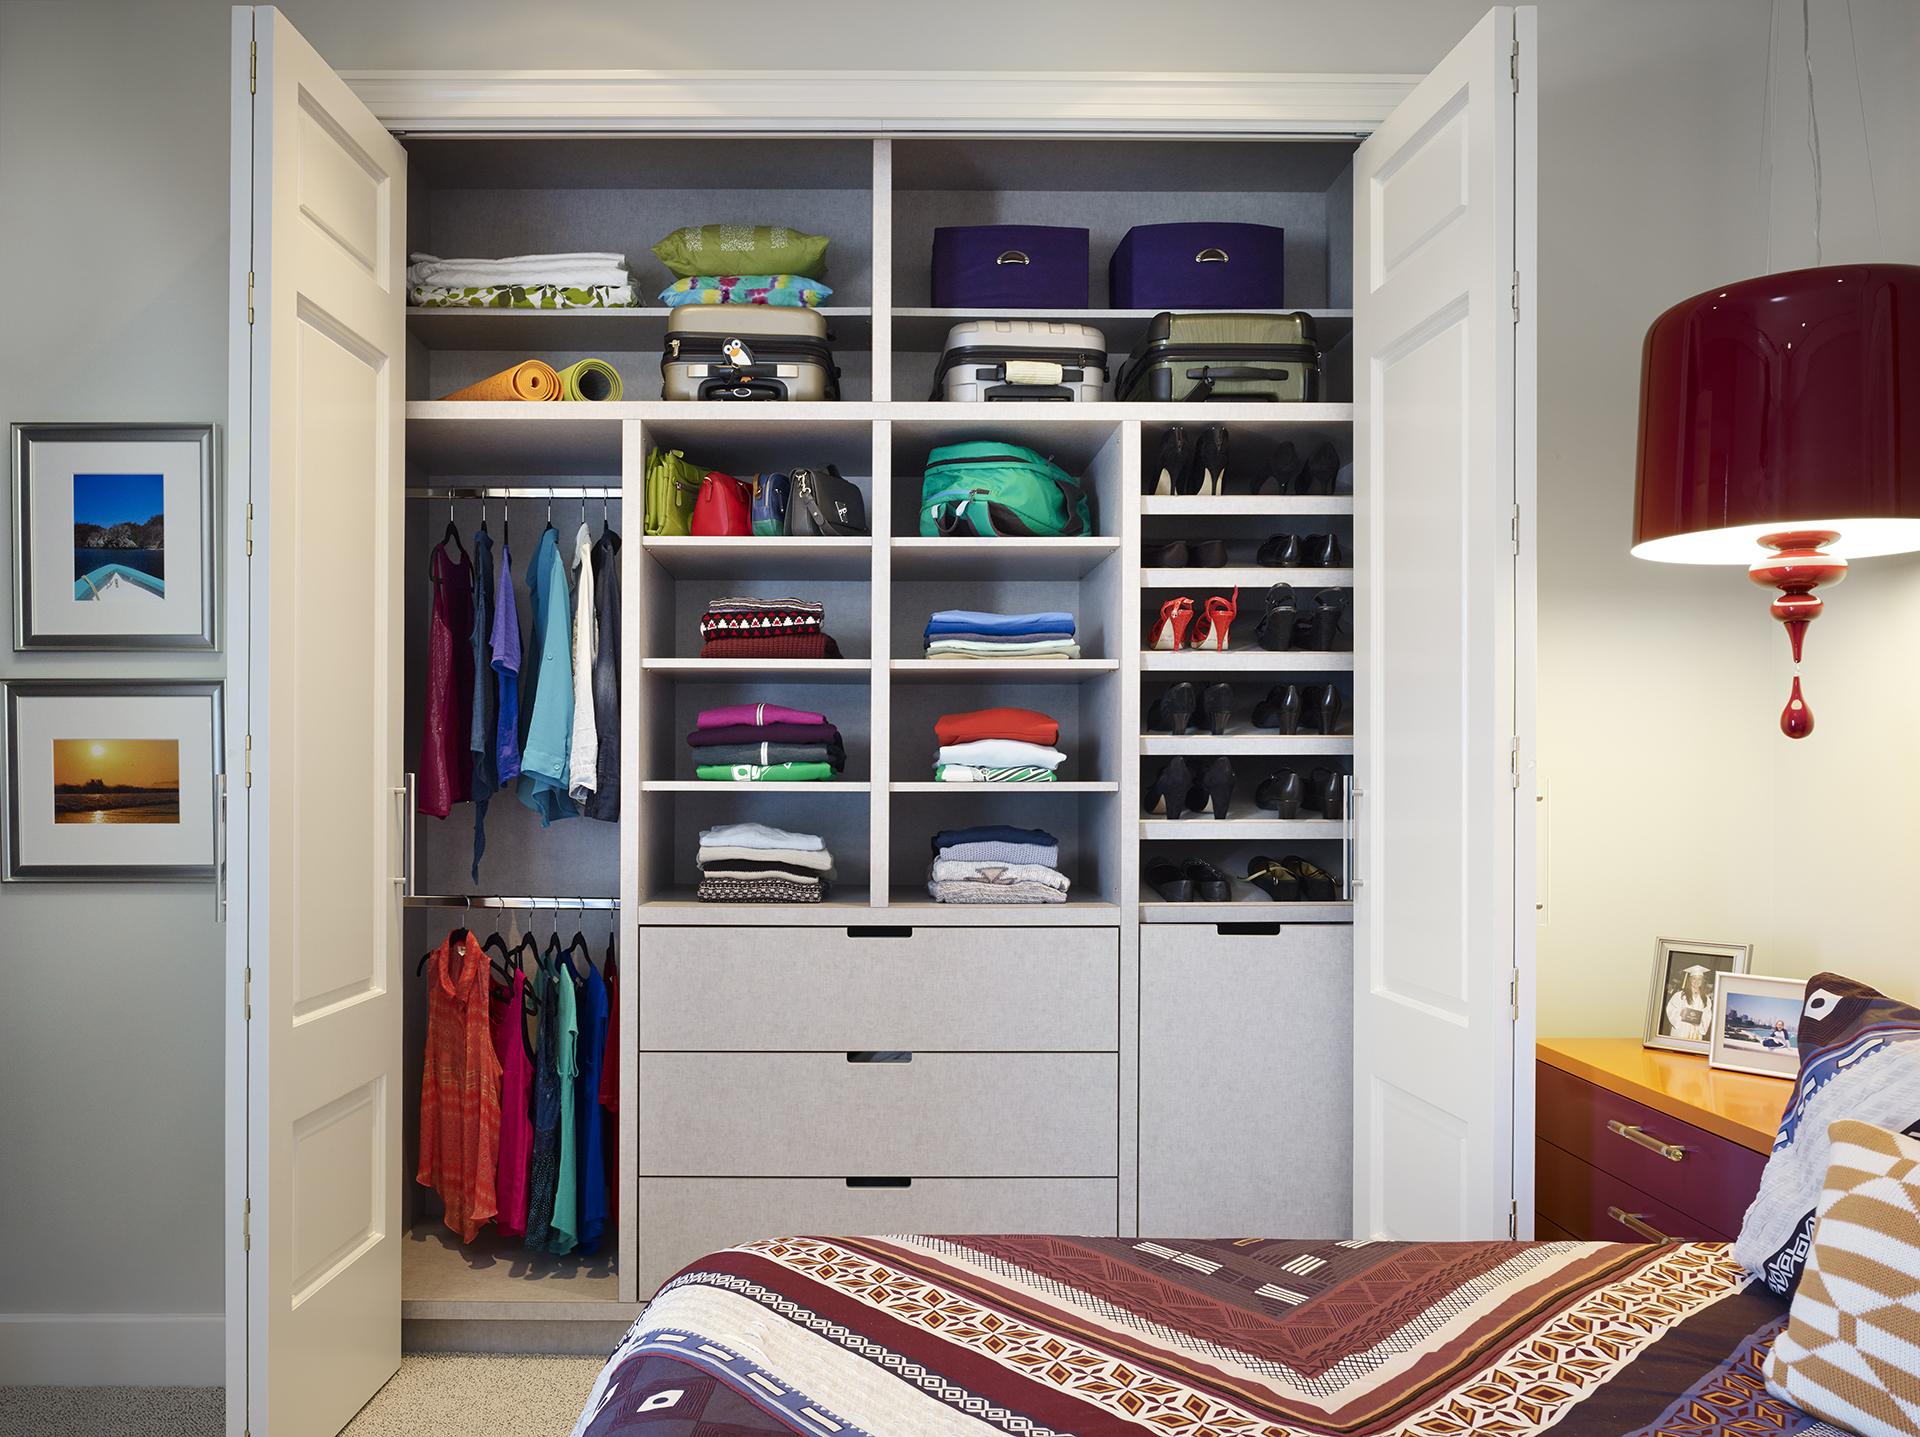 Kaitlyn's Room